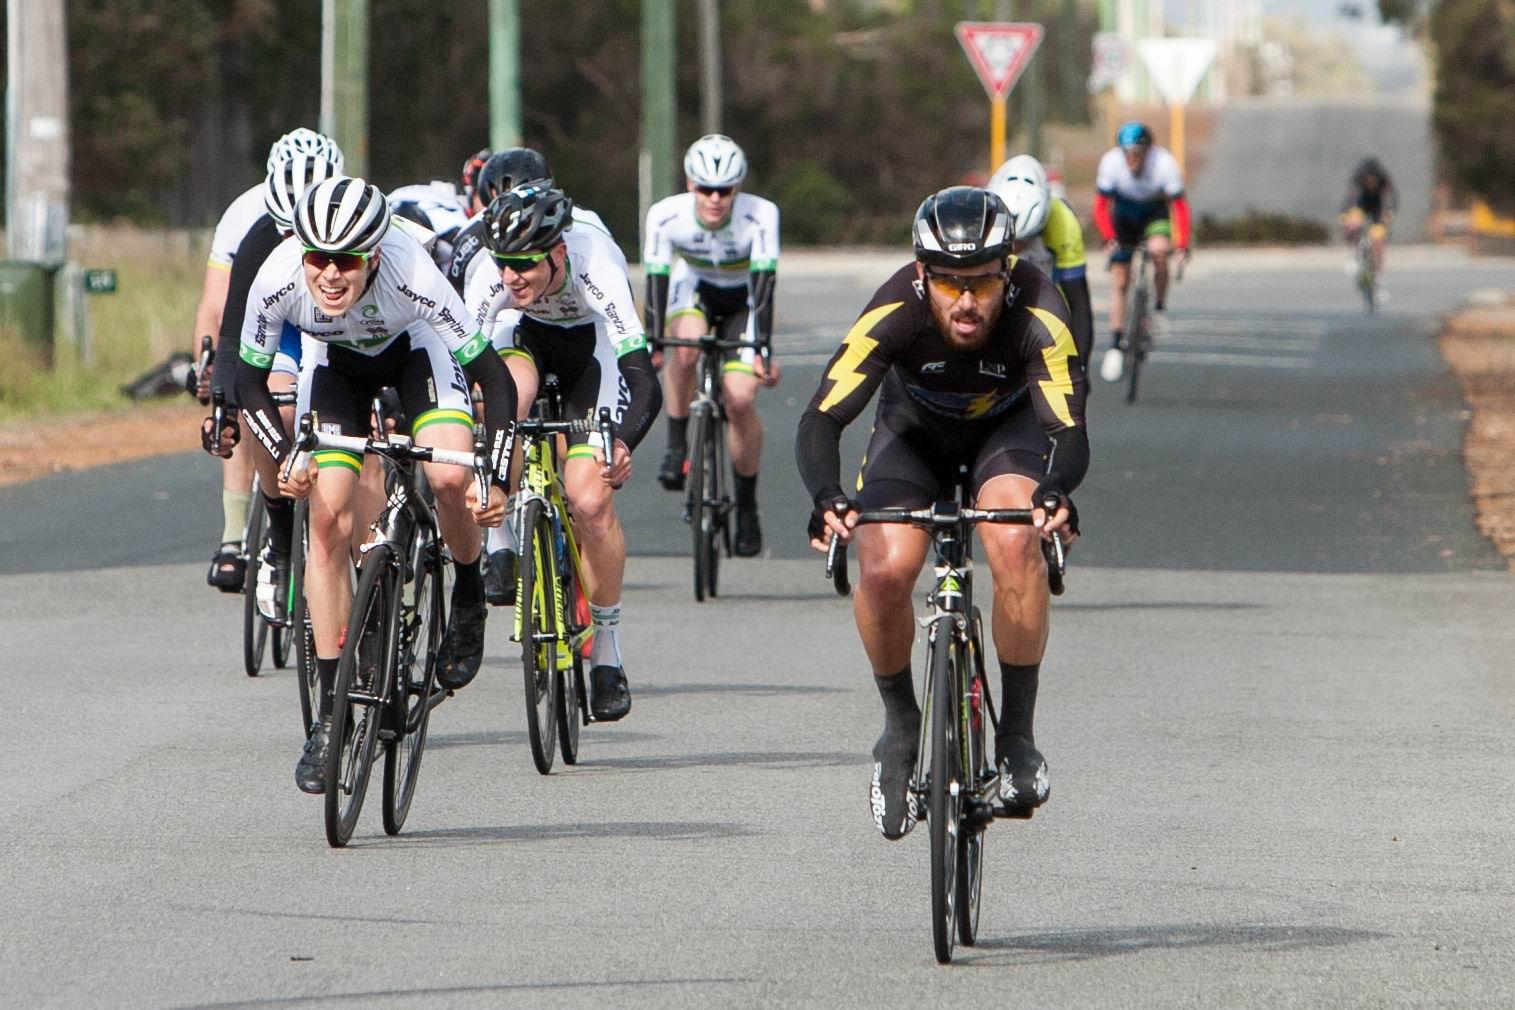 Cycling: final Peel Districts Cycling club race of the season